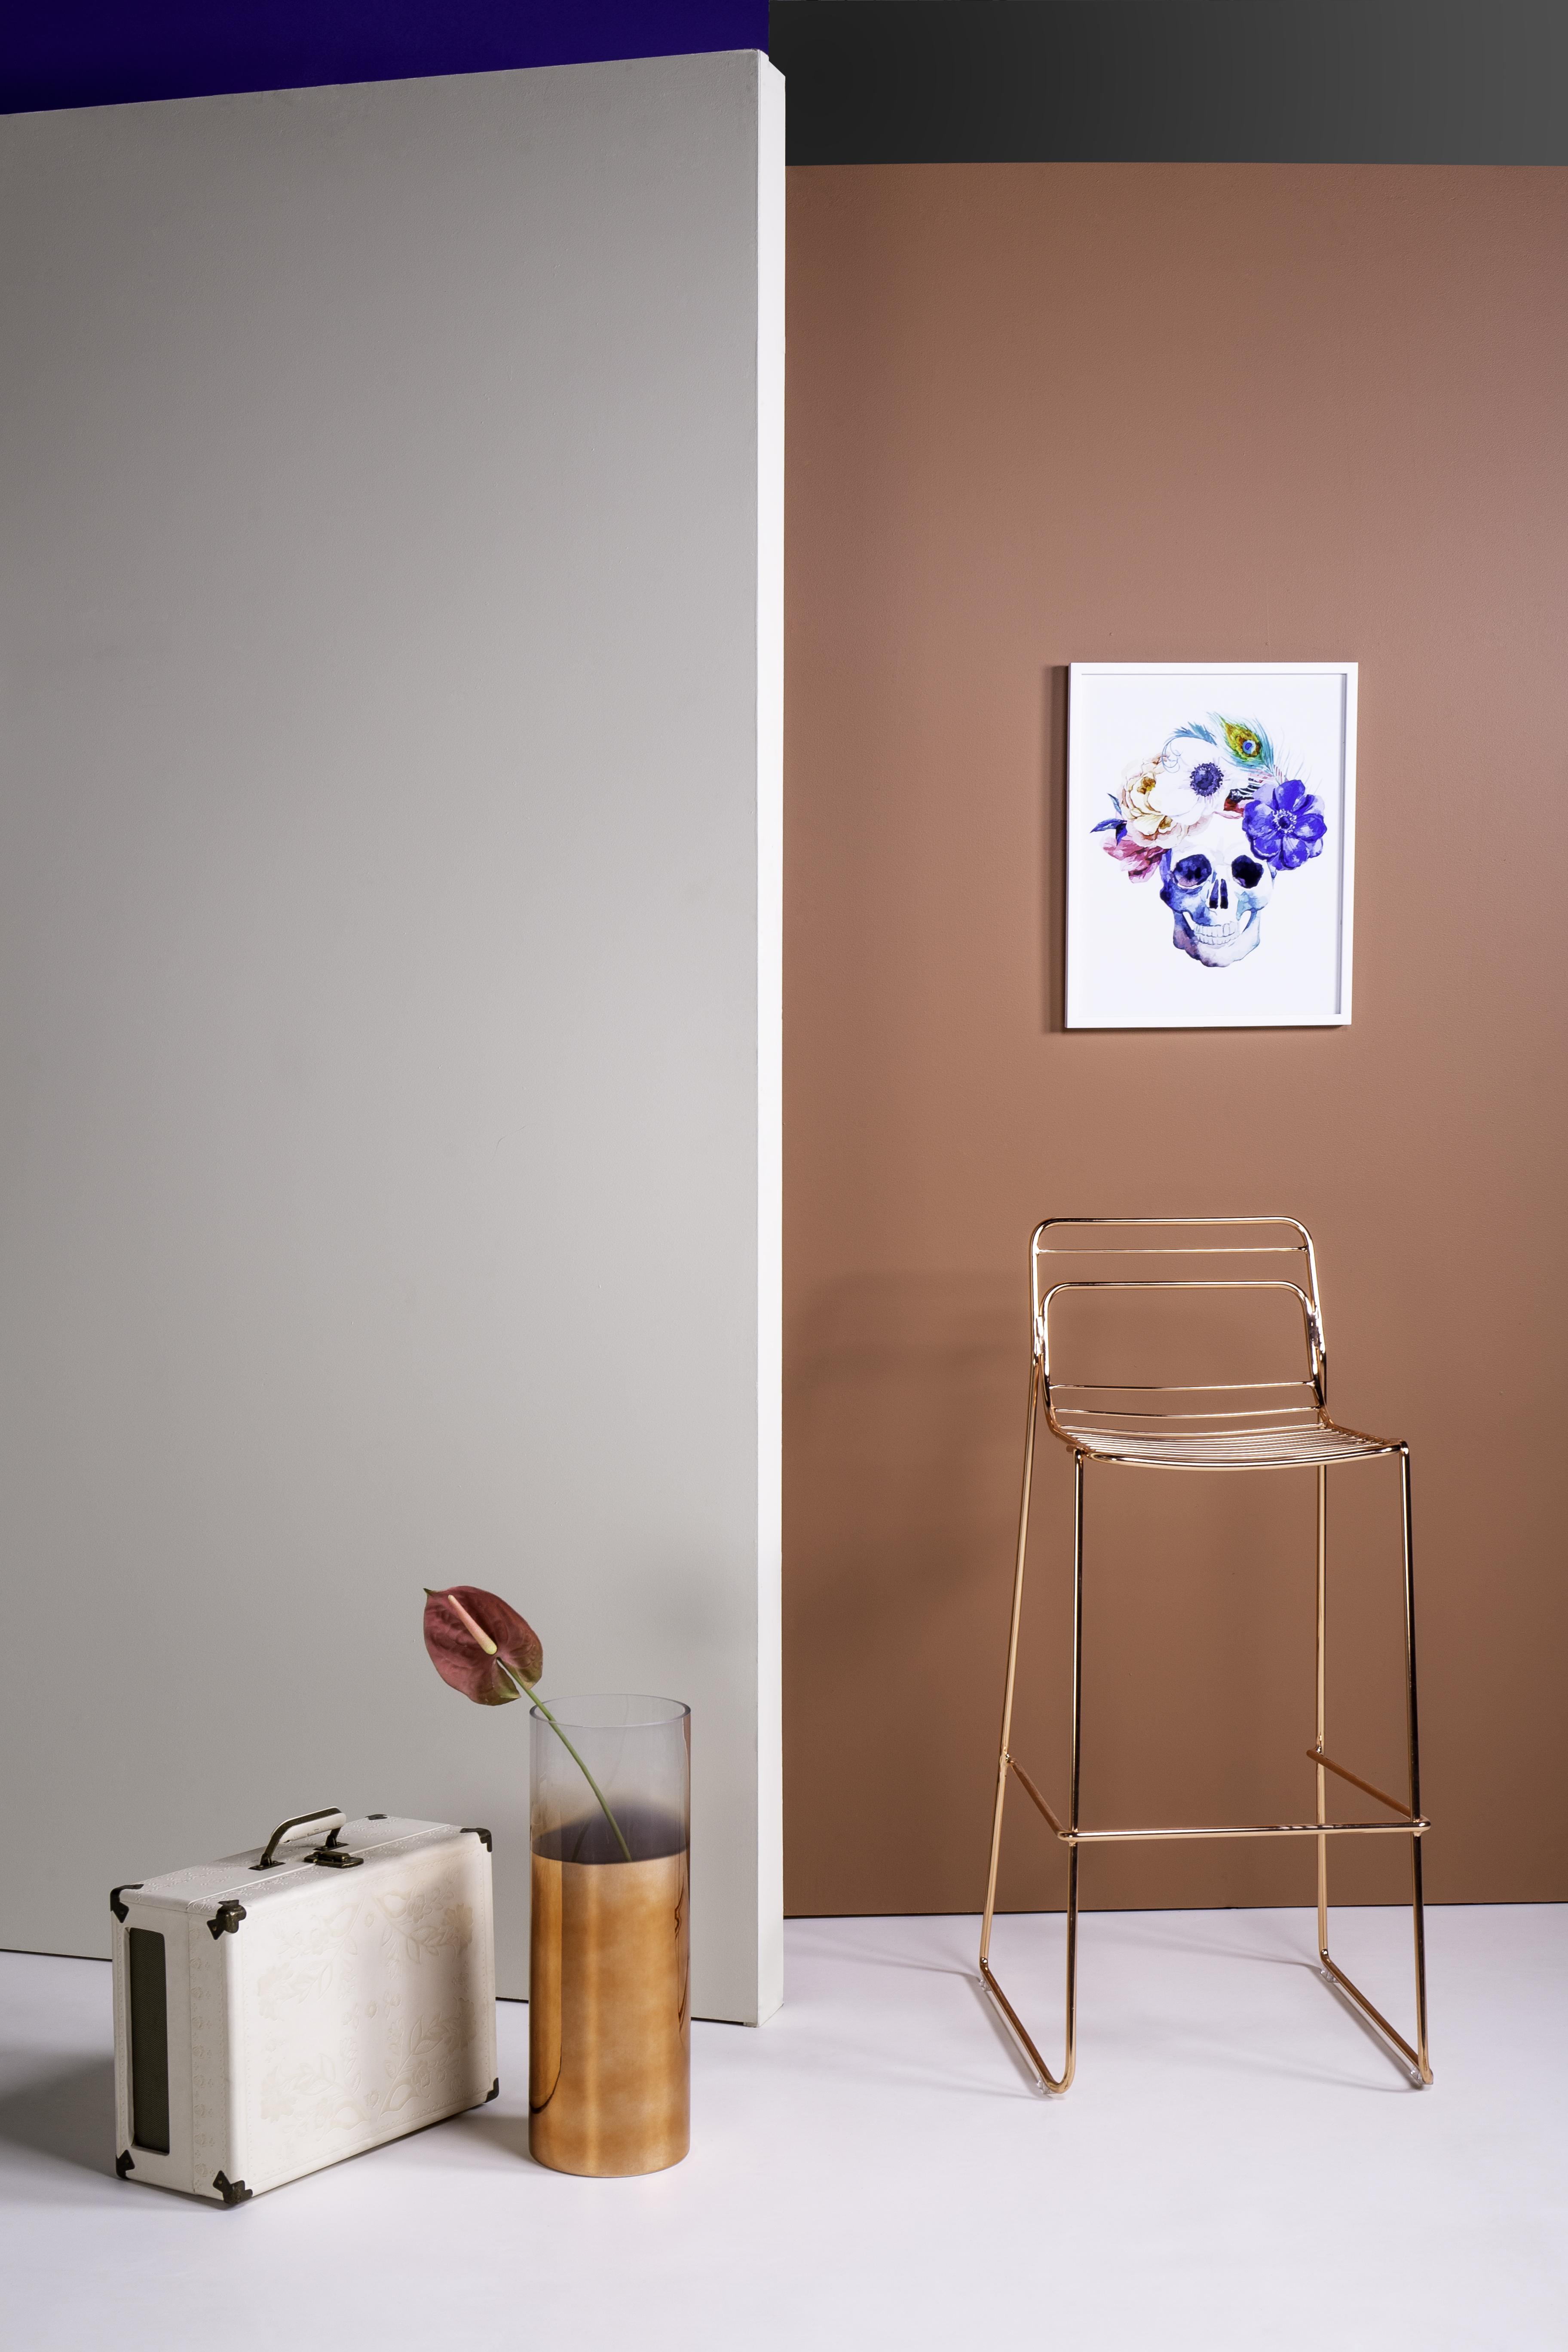 como decorar espacios pequeños portada